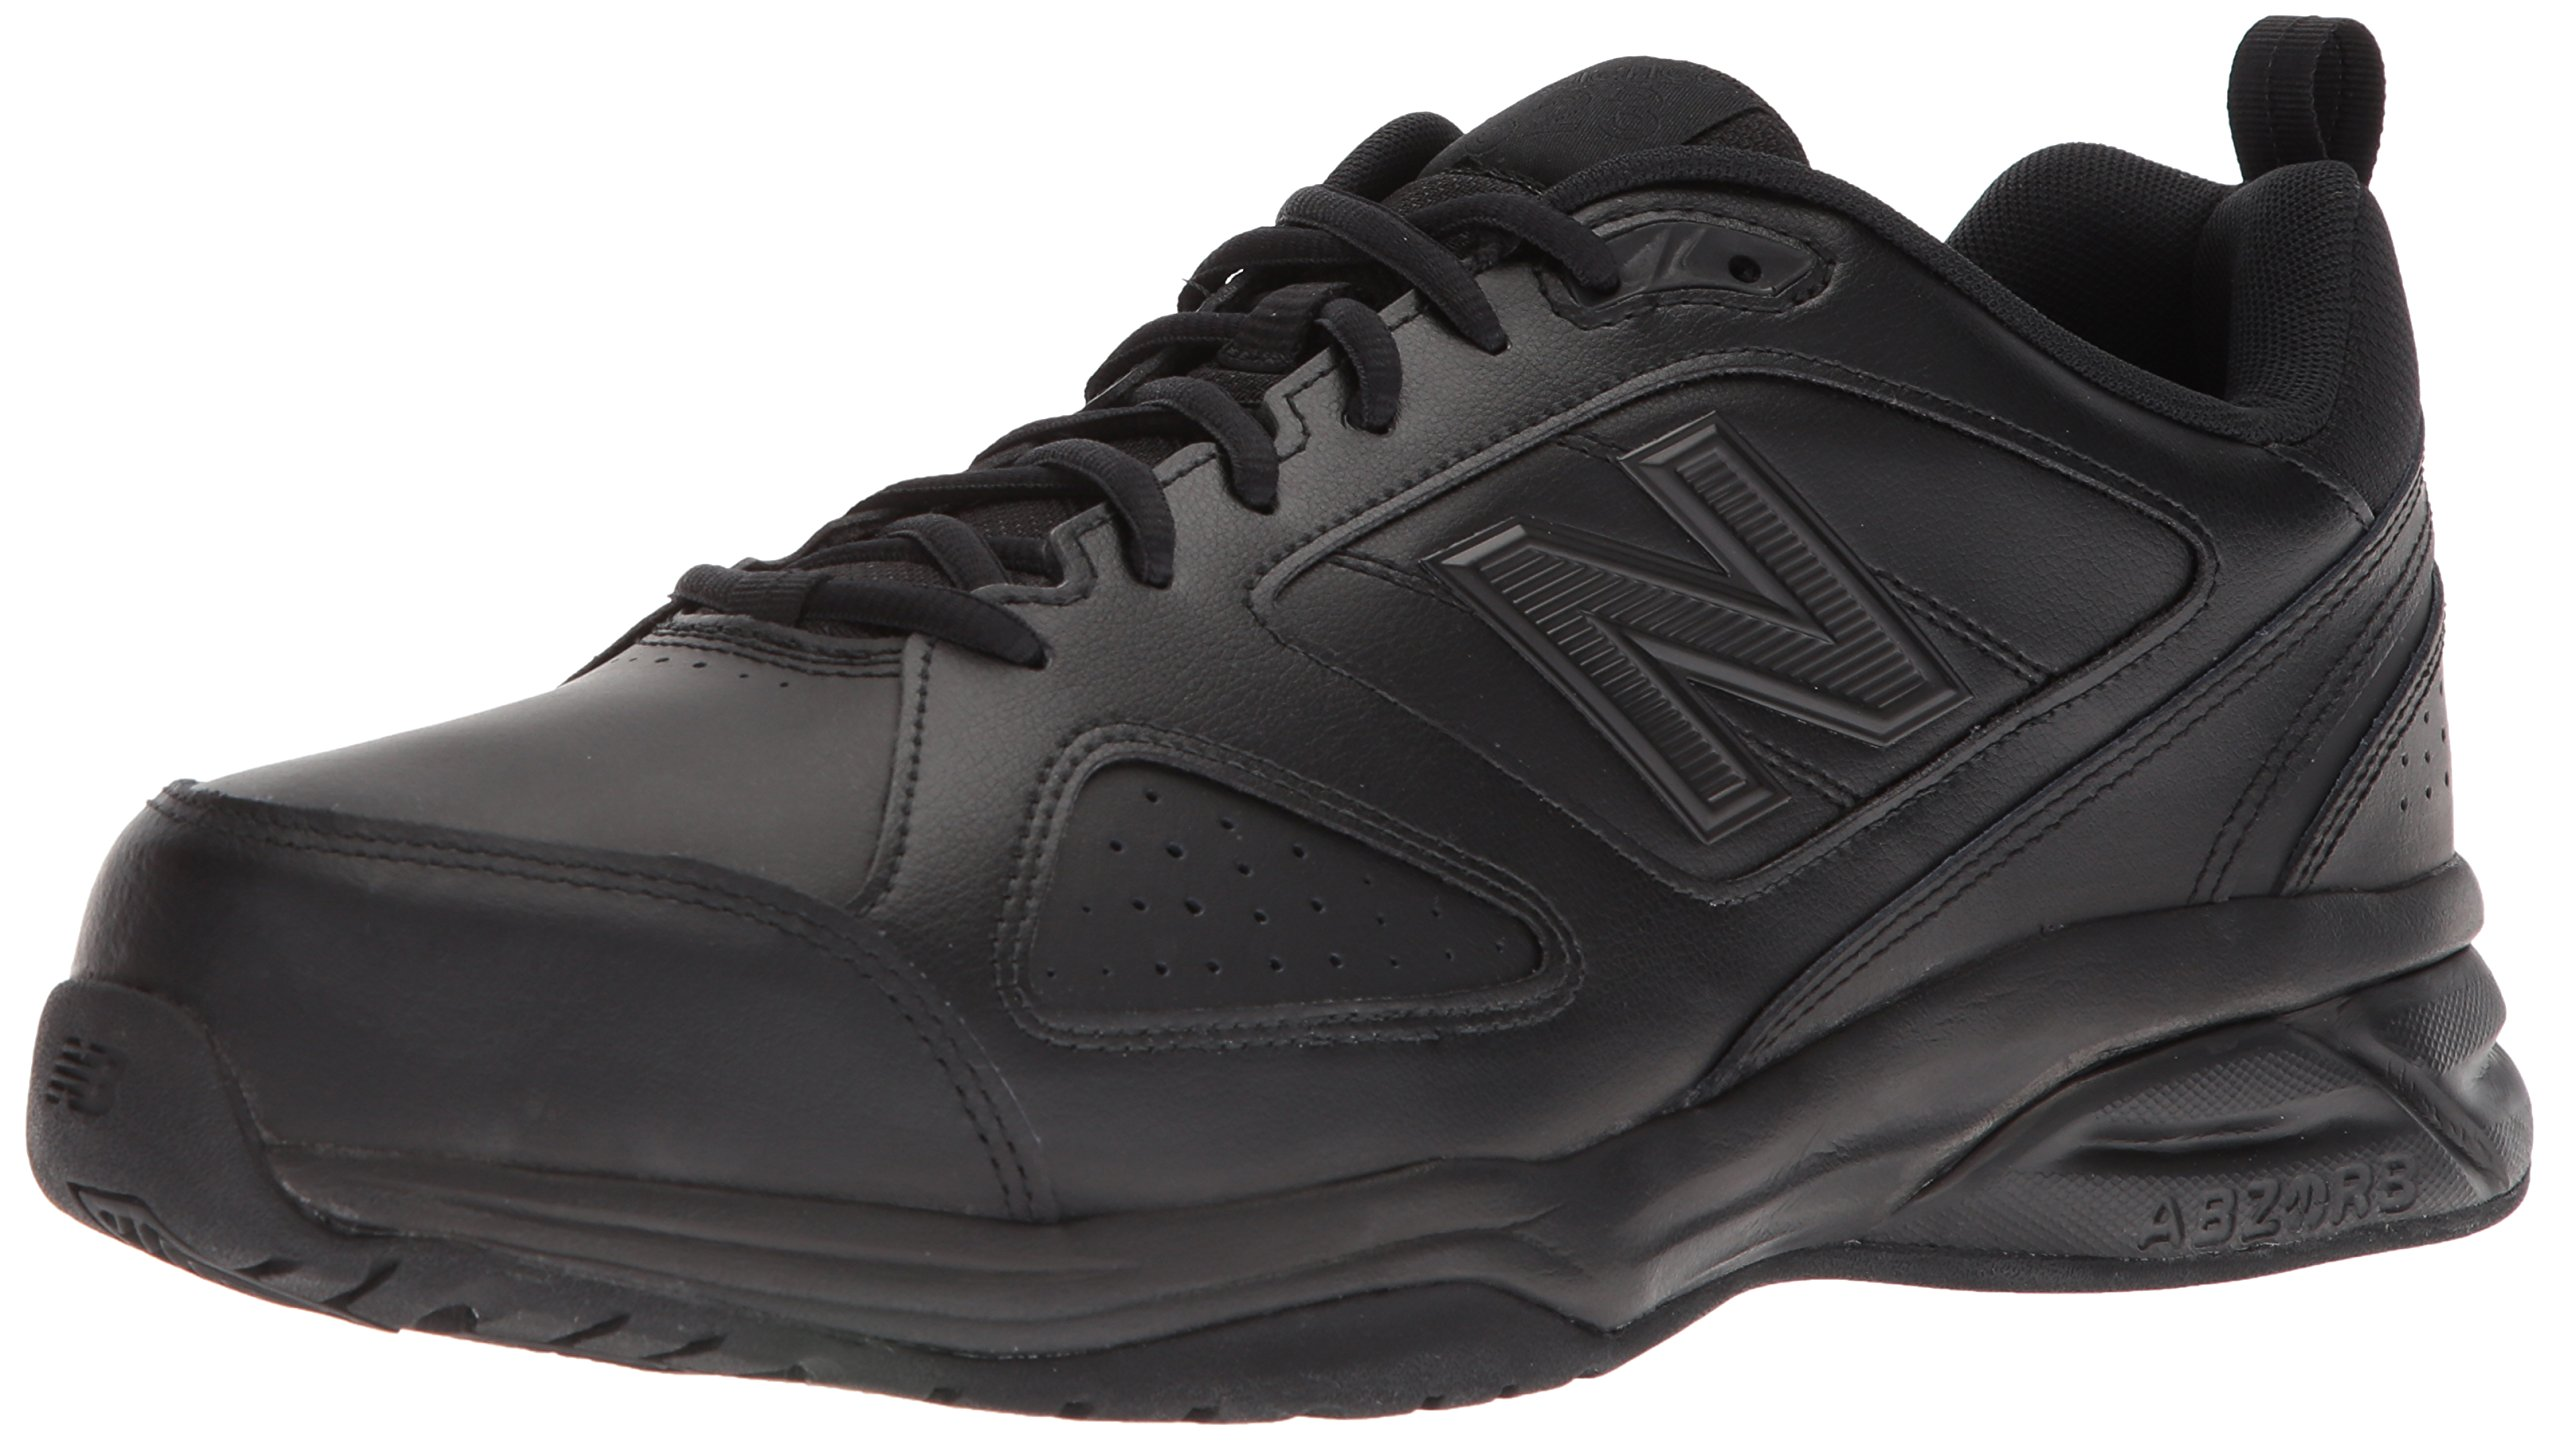 New Balance MX623v3 Comfort Training